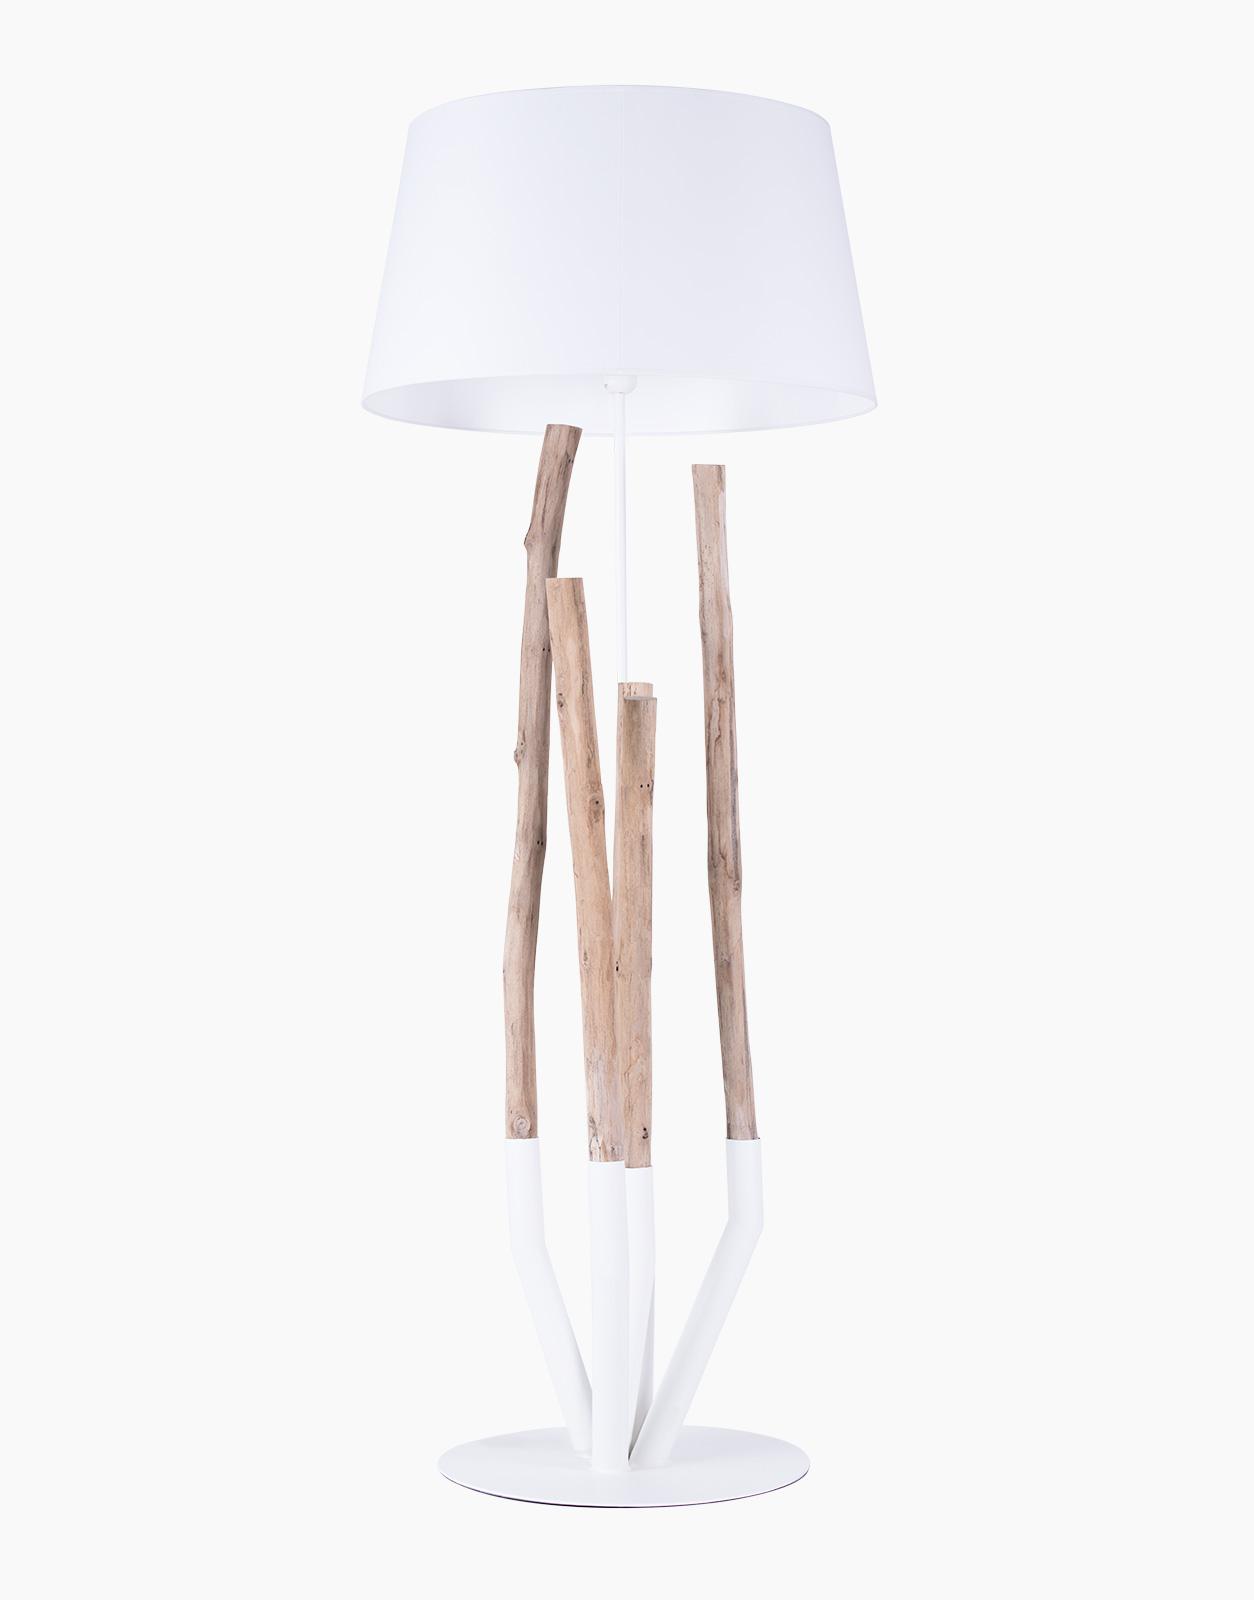 Floor Lamp Lmp Joss Solution Designfr Furniture Lighting Decoration